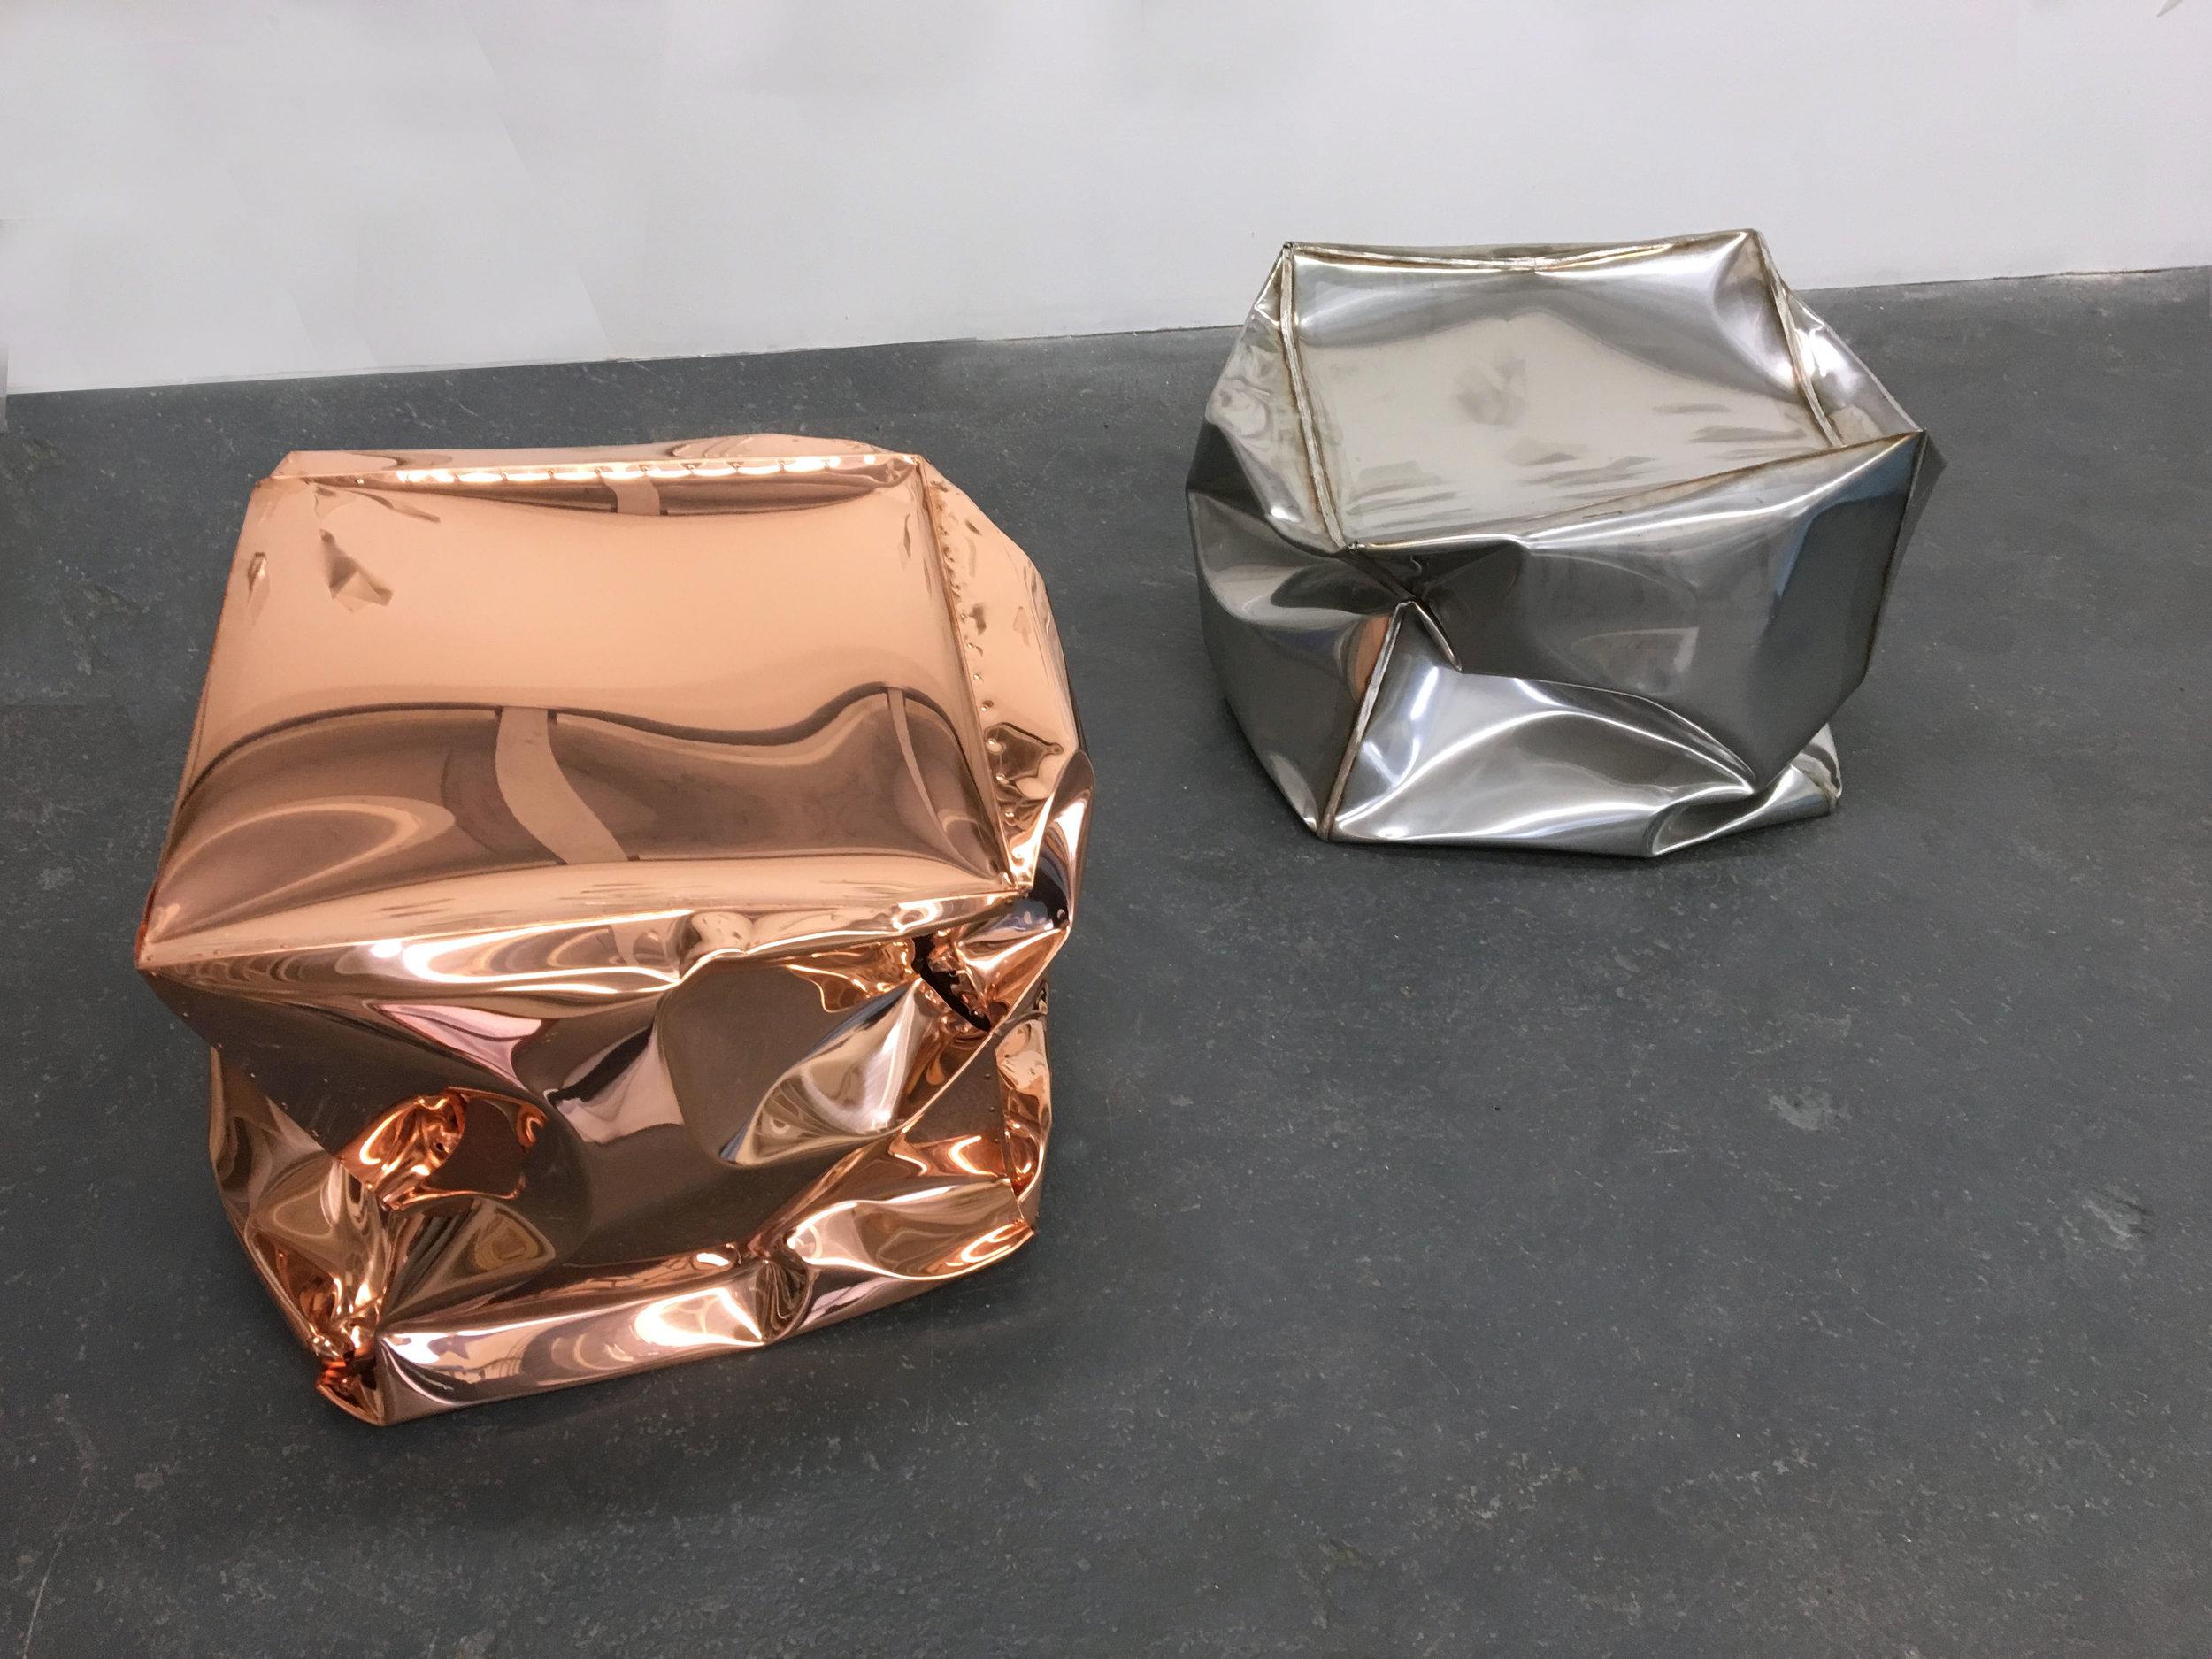 alyson-shotz-crushed-cubes.JPG